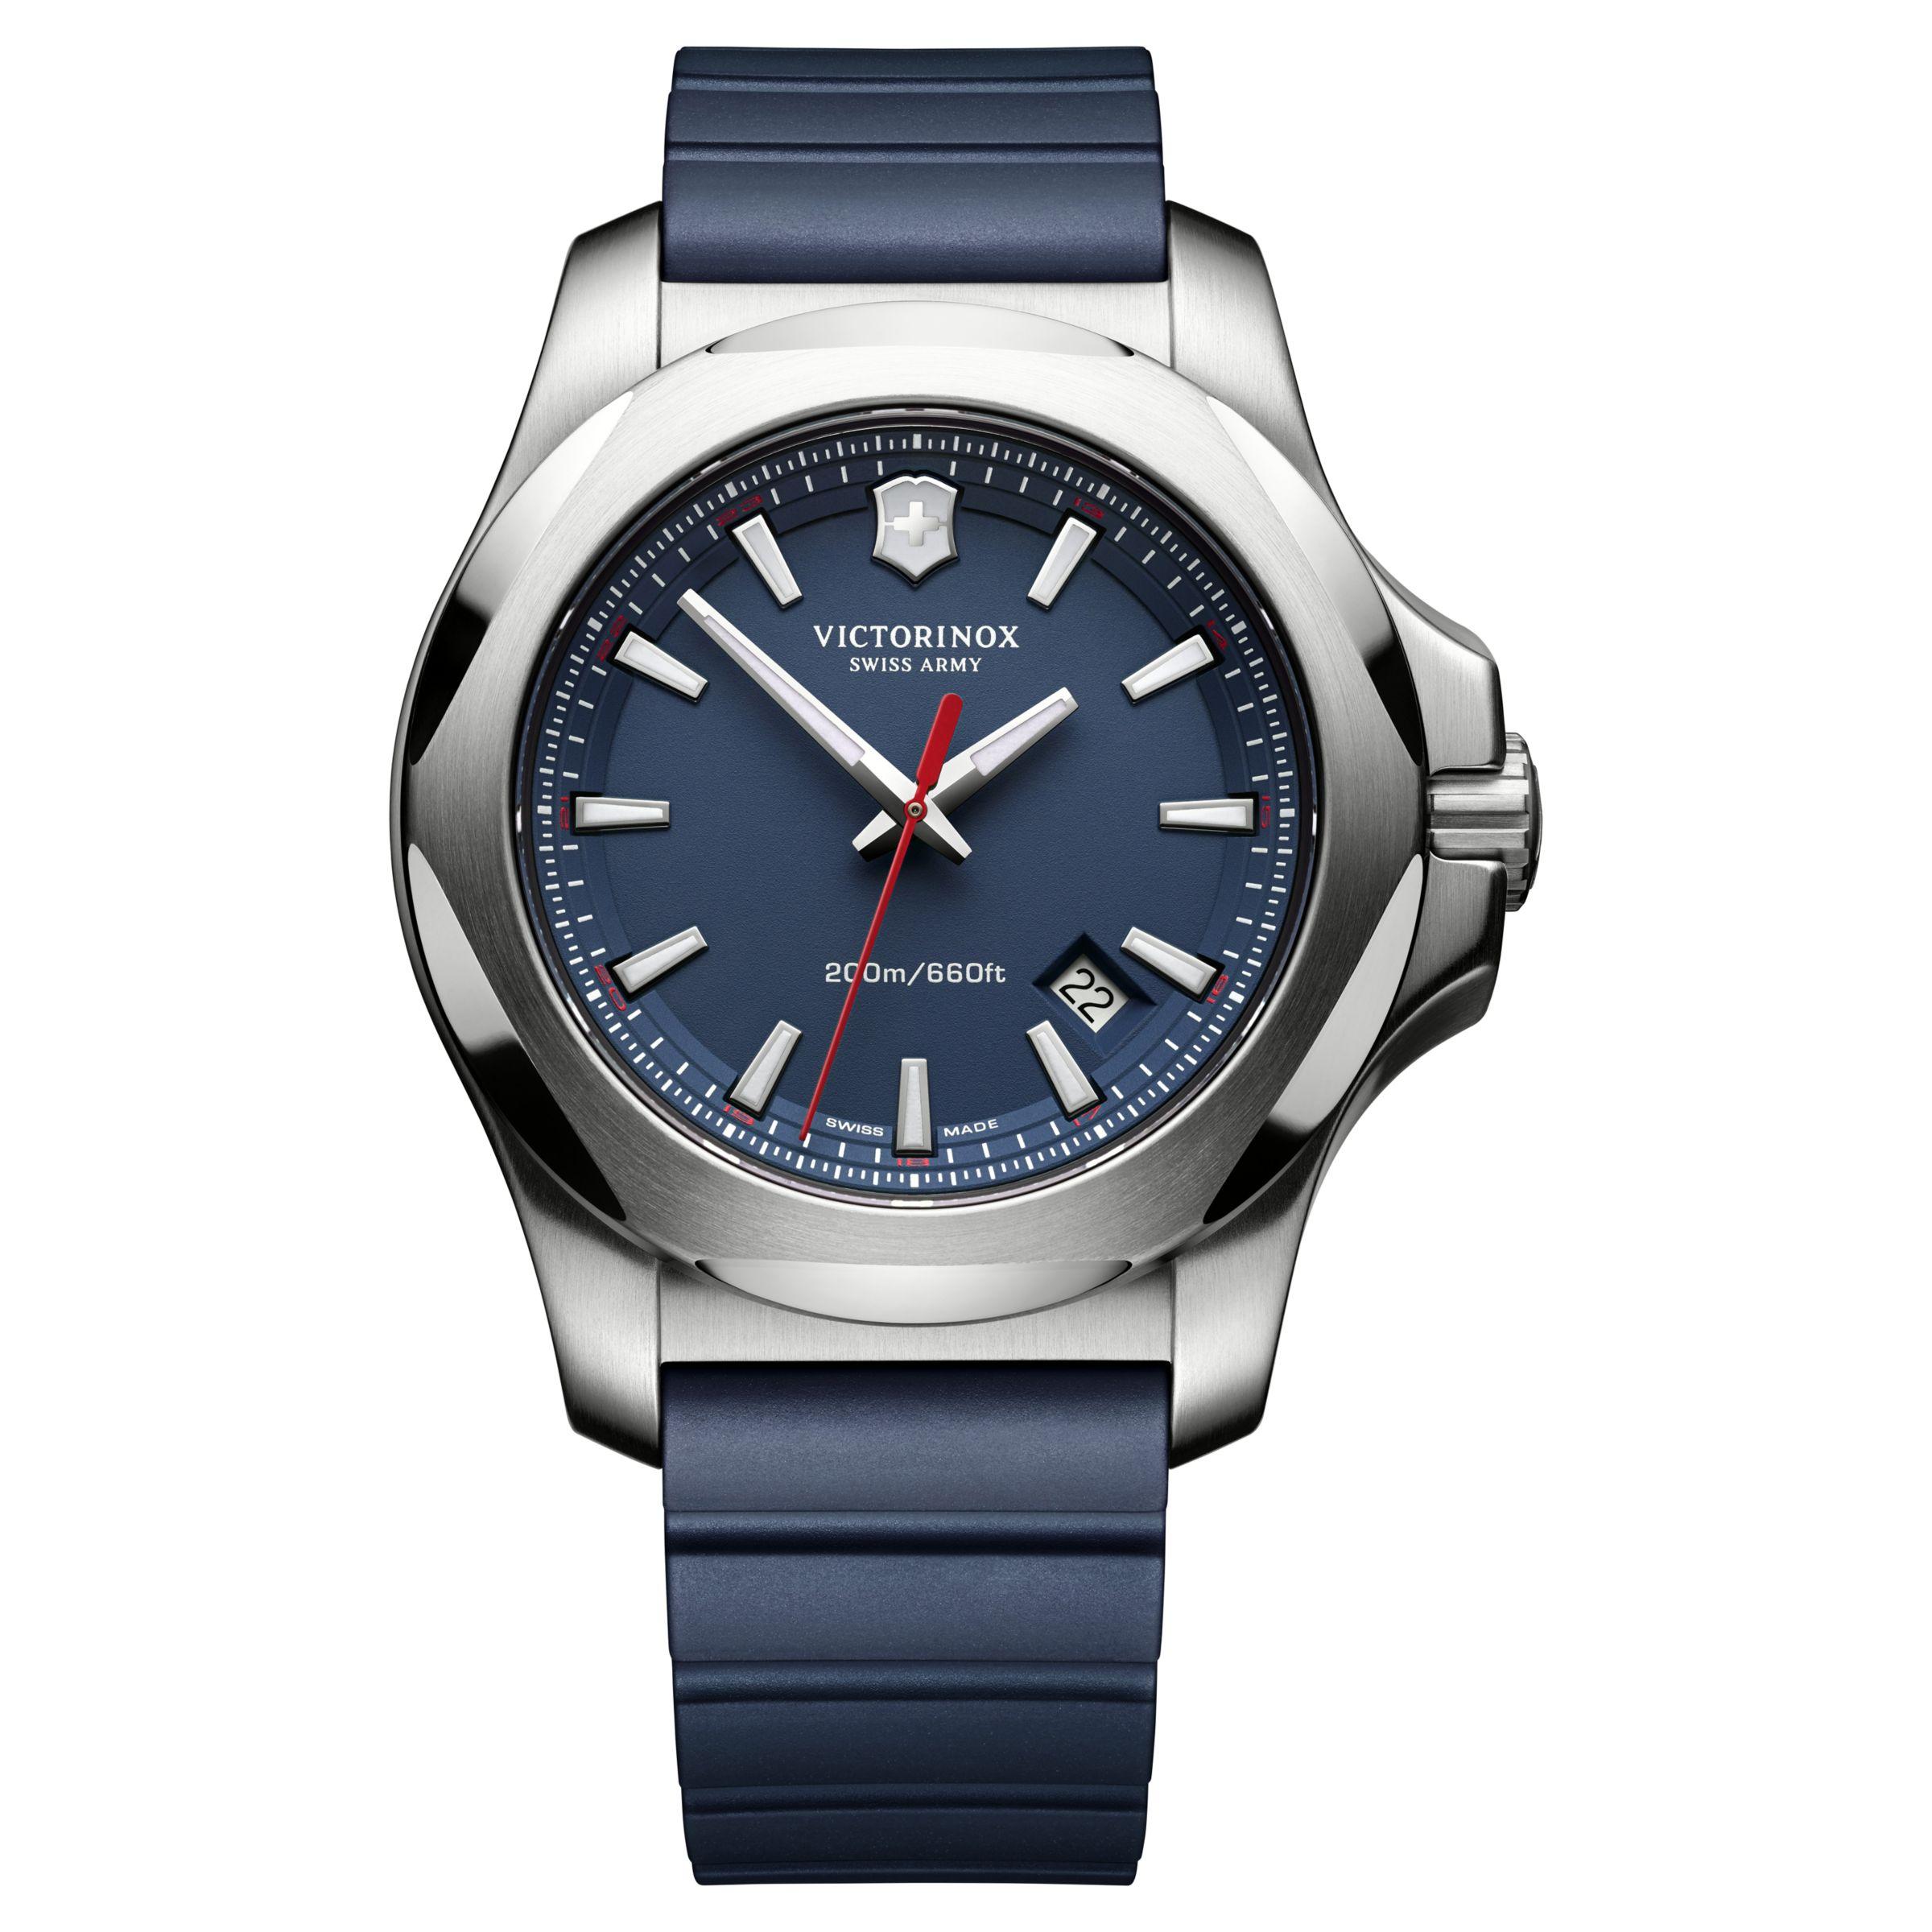 Victorinox Victorinox Men's I.N.O.X Rubber Strap Watch